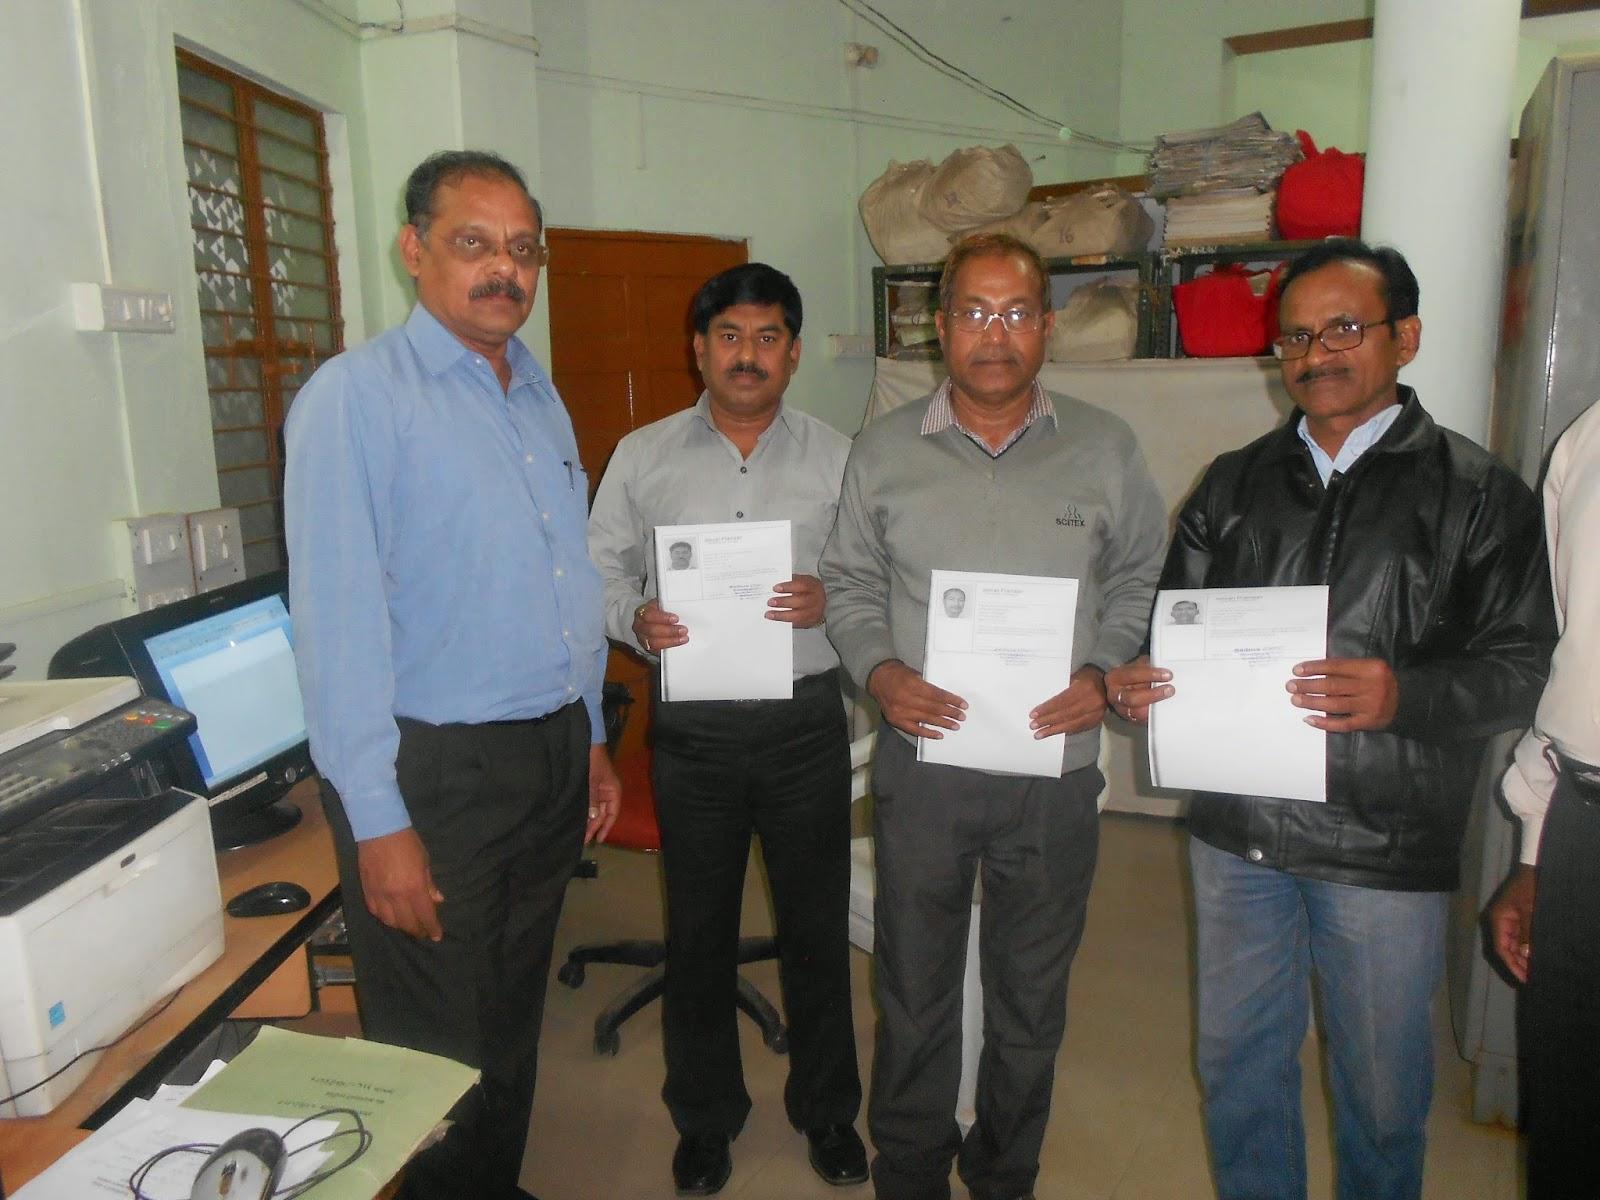 sainik jeevan Swatantra sainik samman pension scheme,  life insurance corporation (lic) in india offers 4 major pension plans by the name of jeevan nidhi,.